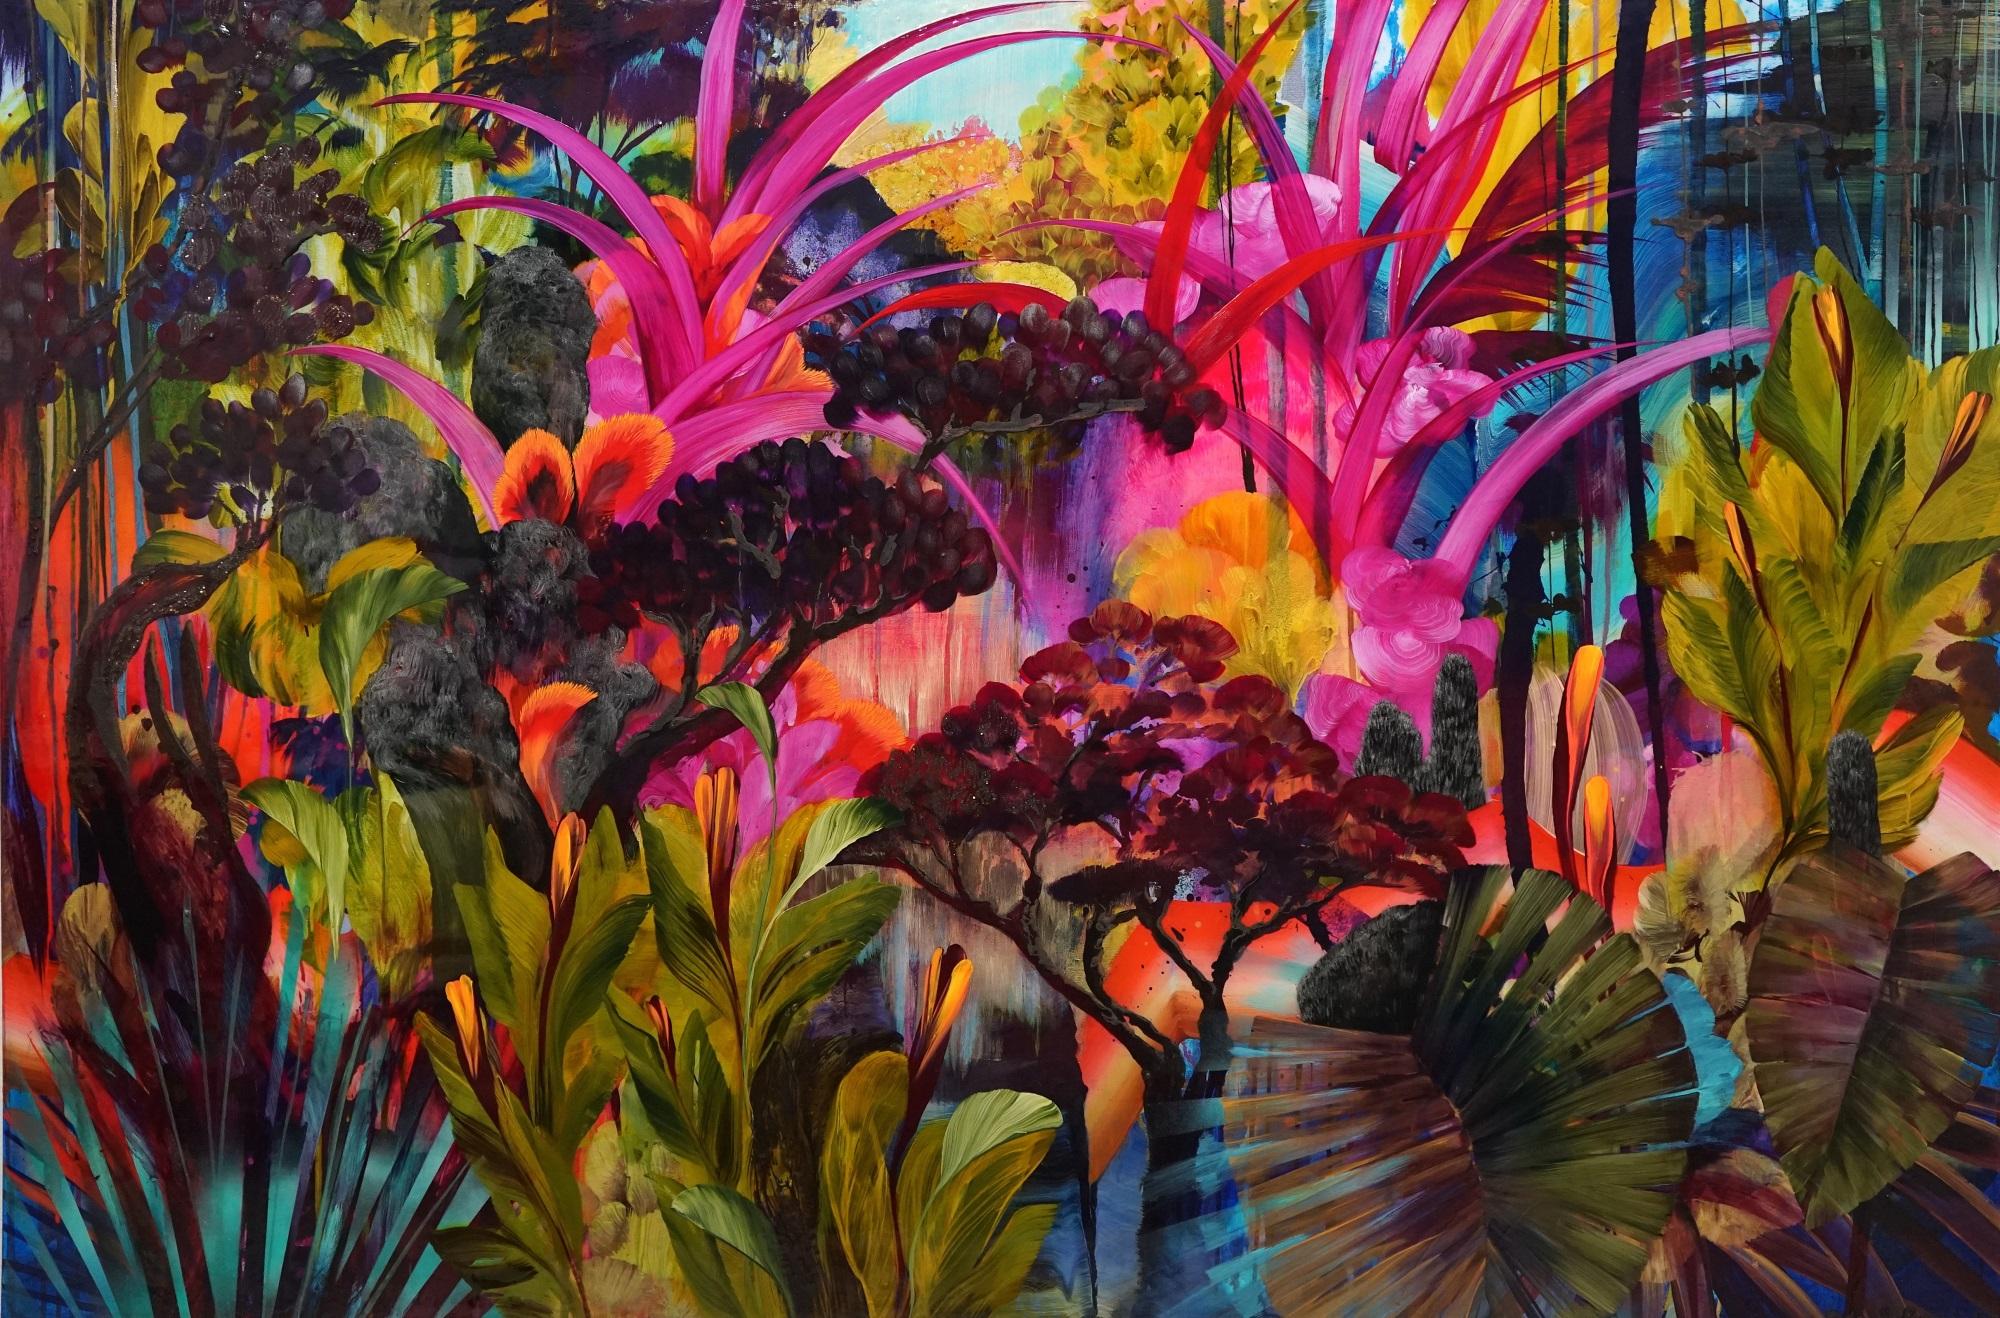 'Feuille' Orlanda Broom Mixed Media on canvas, 120cm x 180cm, 2017